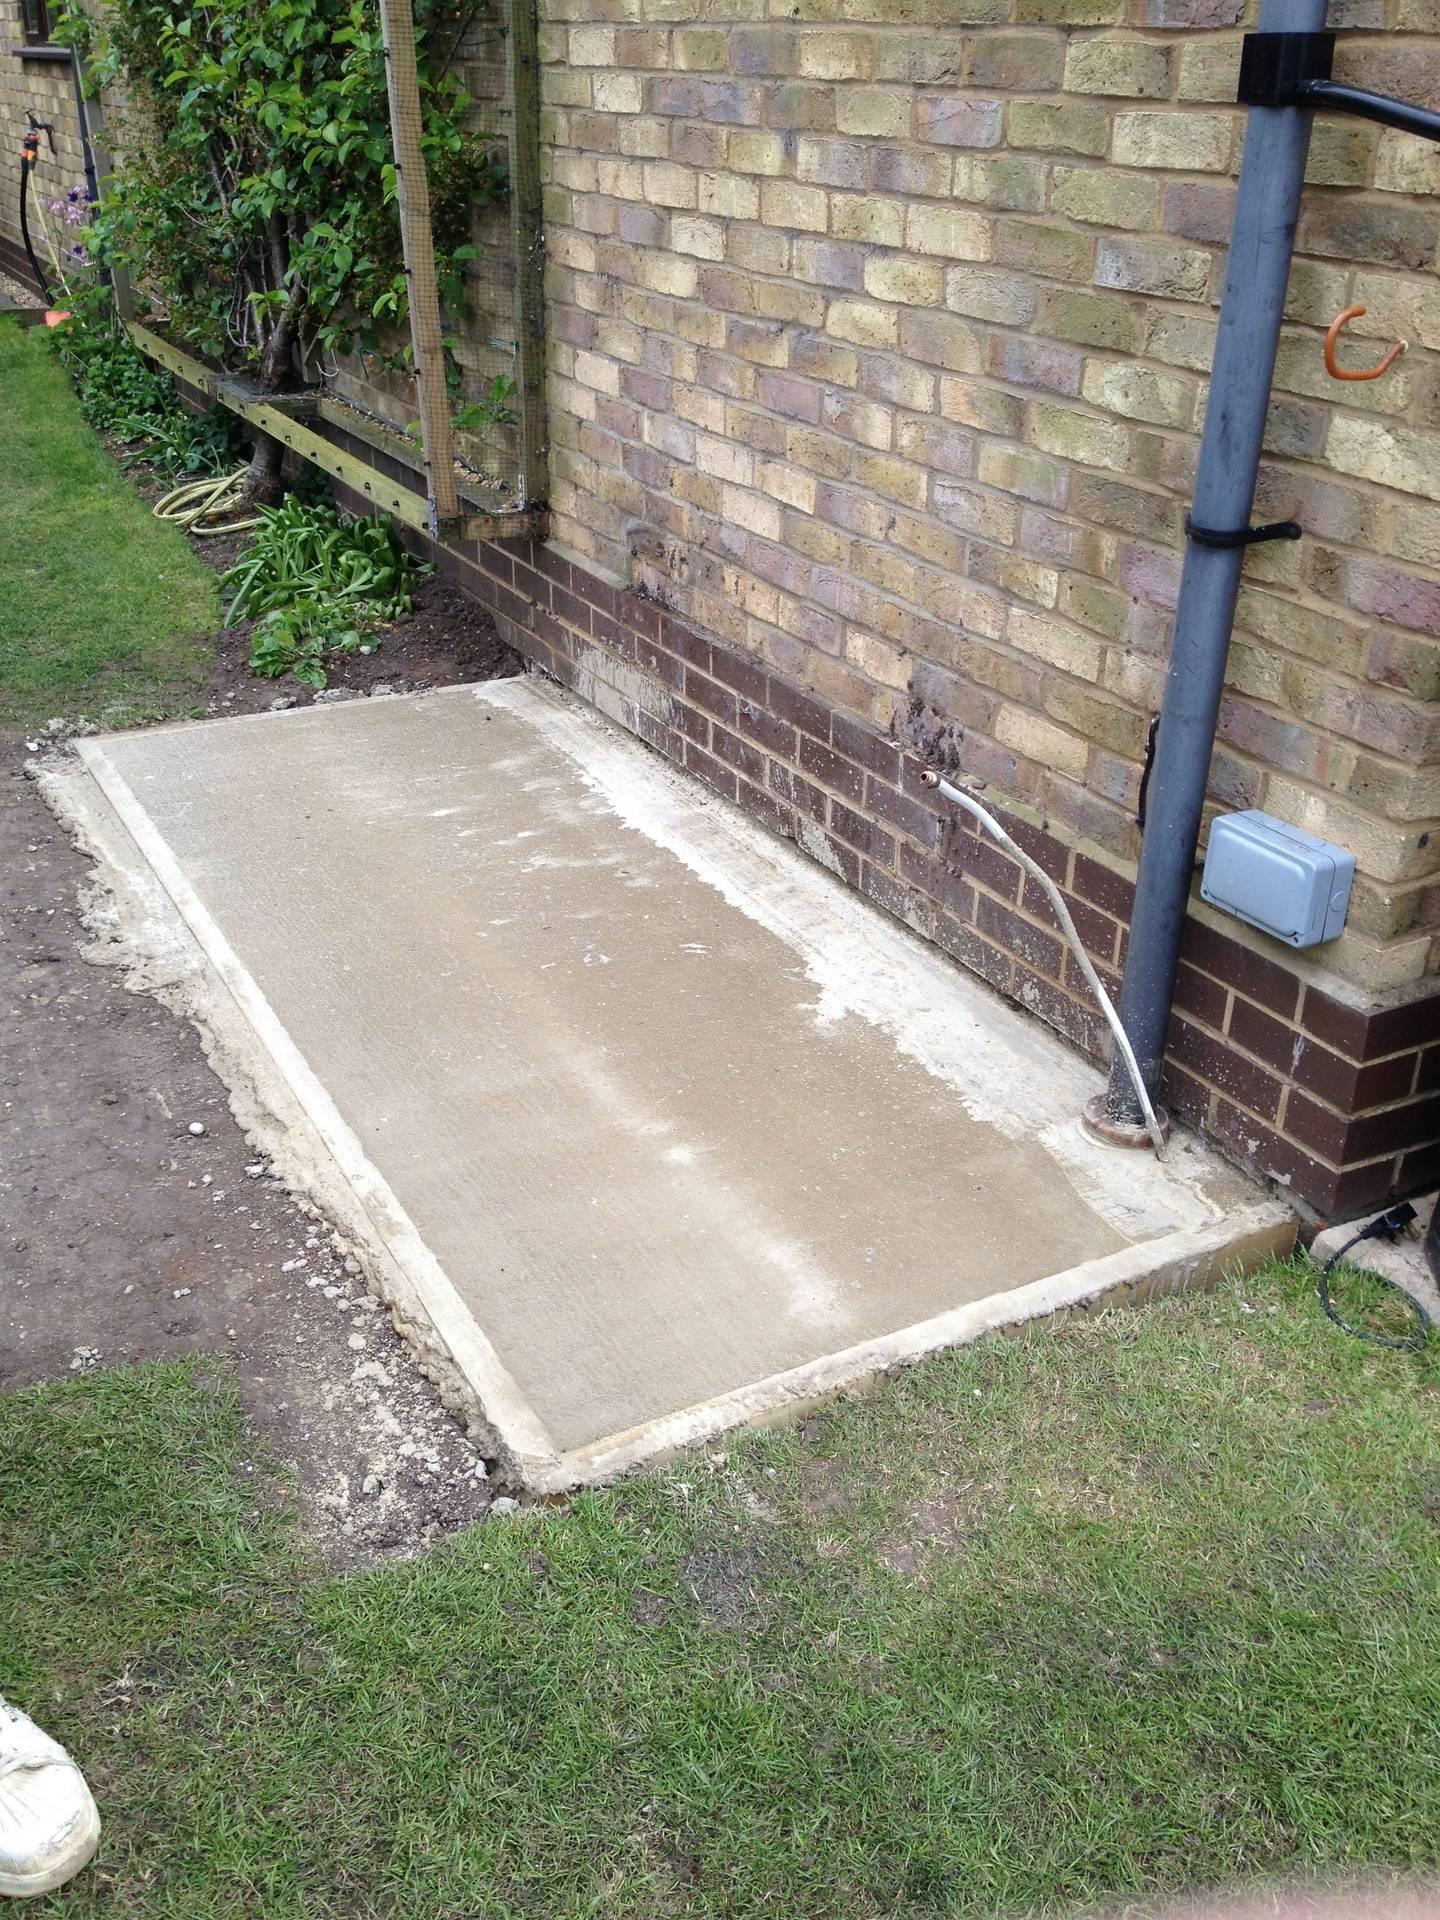 New concrete base